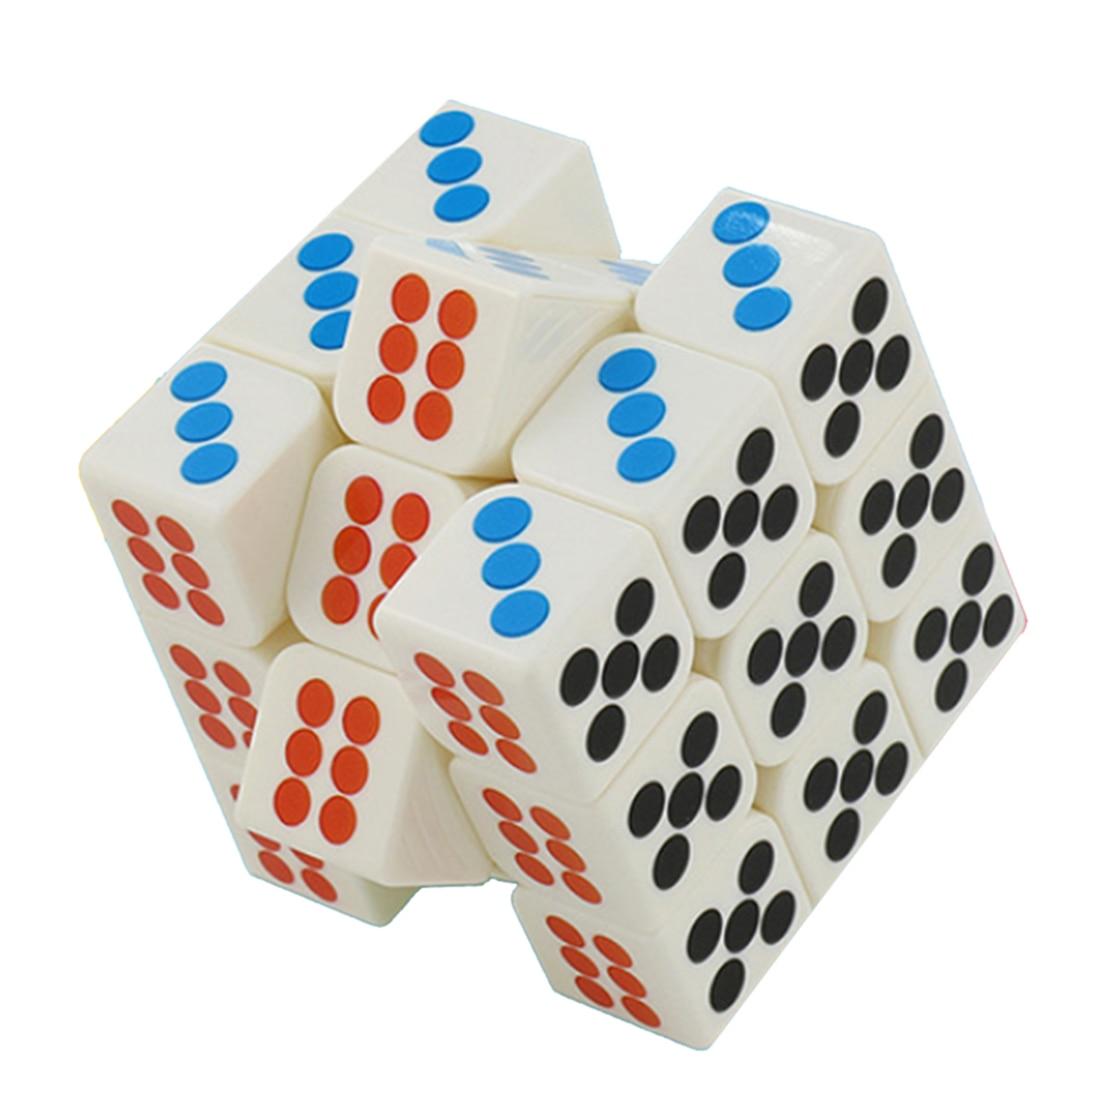 Cubing Classroom MF8827 Smooth 3x3x3 Dice font b Magic b font font b Cube b font